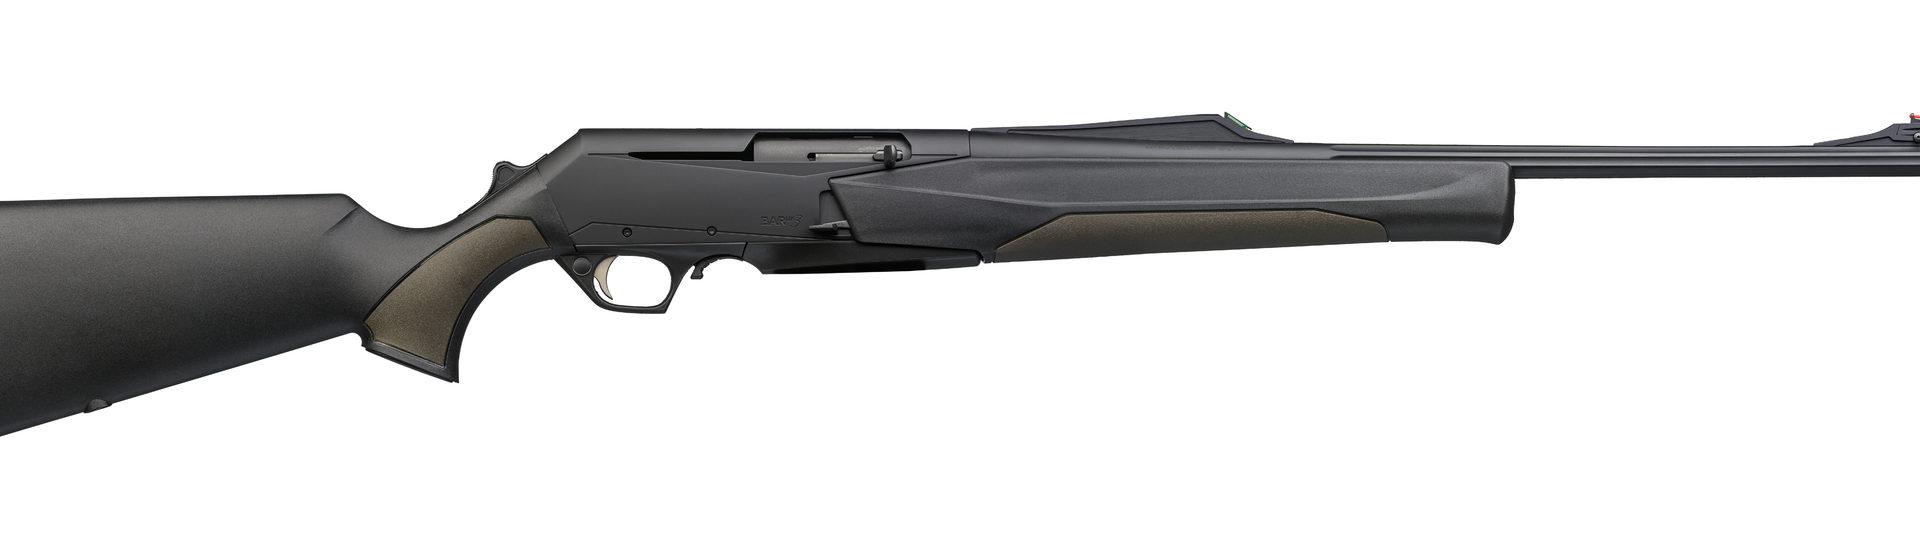 BAR MK3 COMPO BLACK BROWN 1